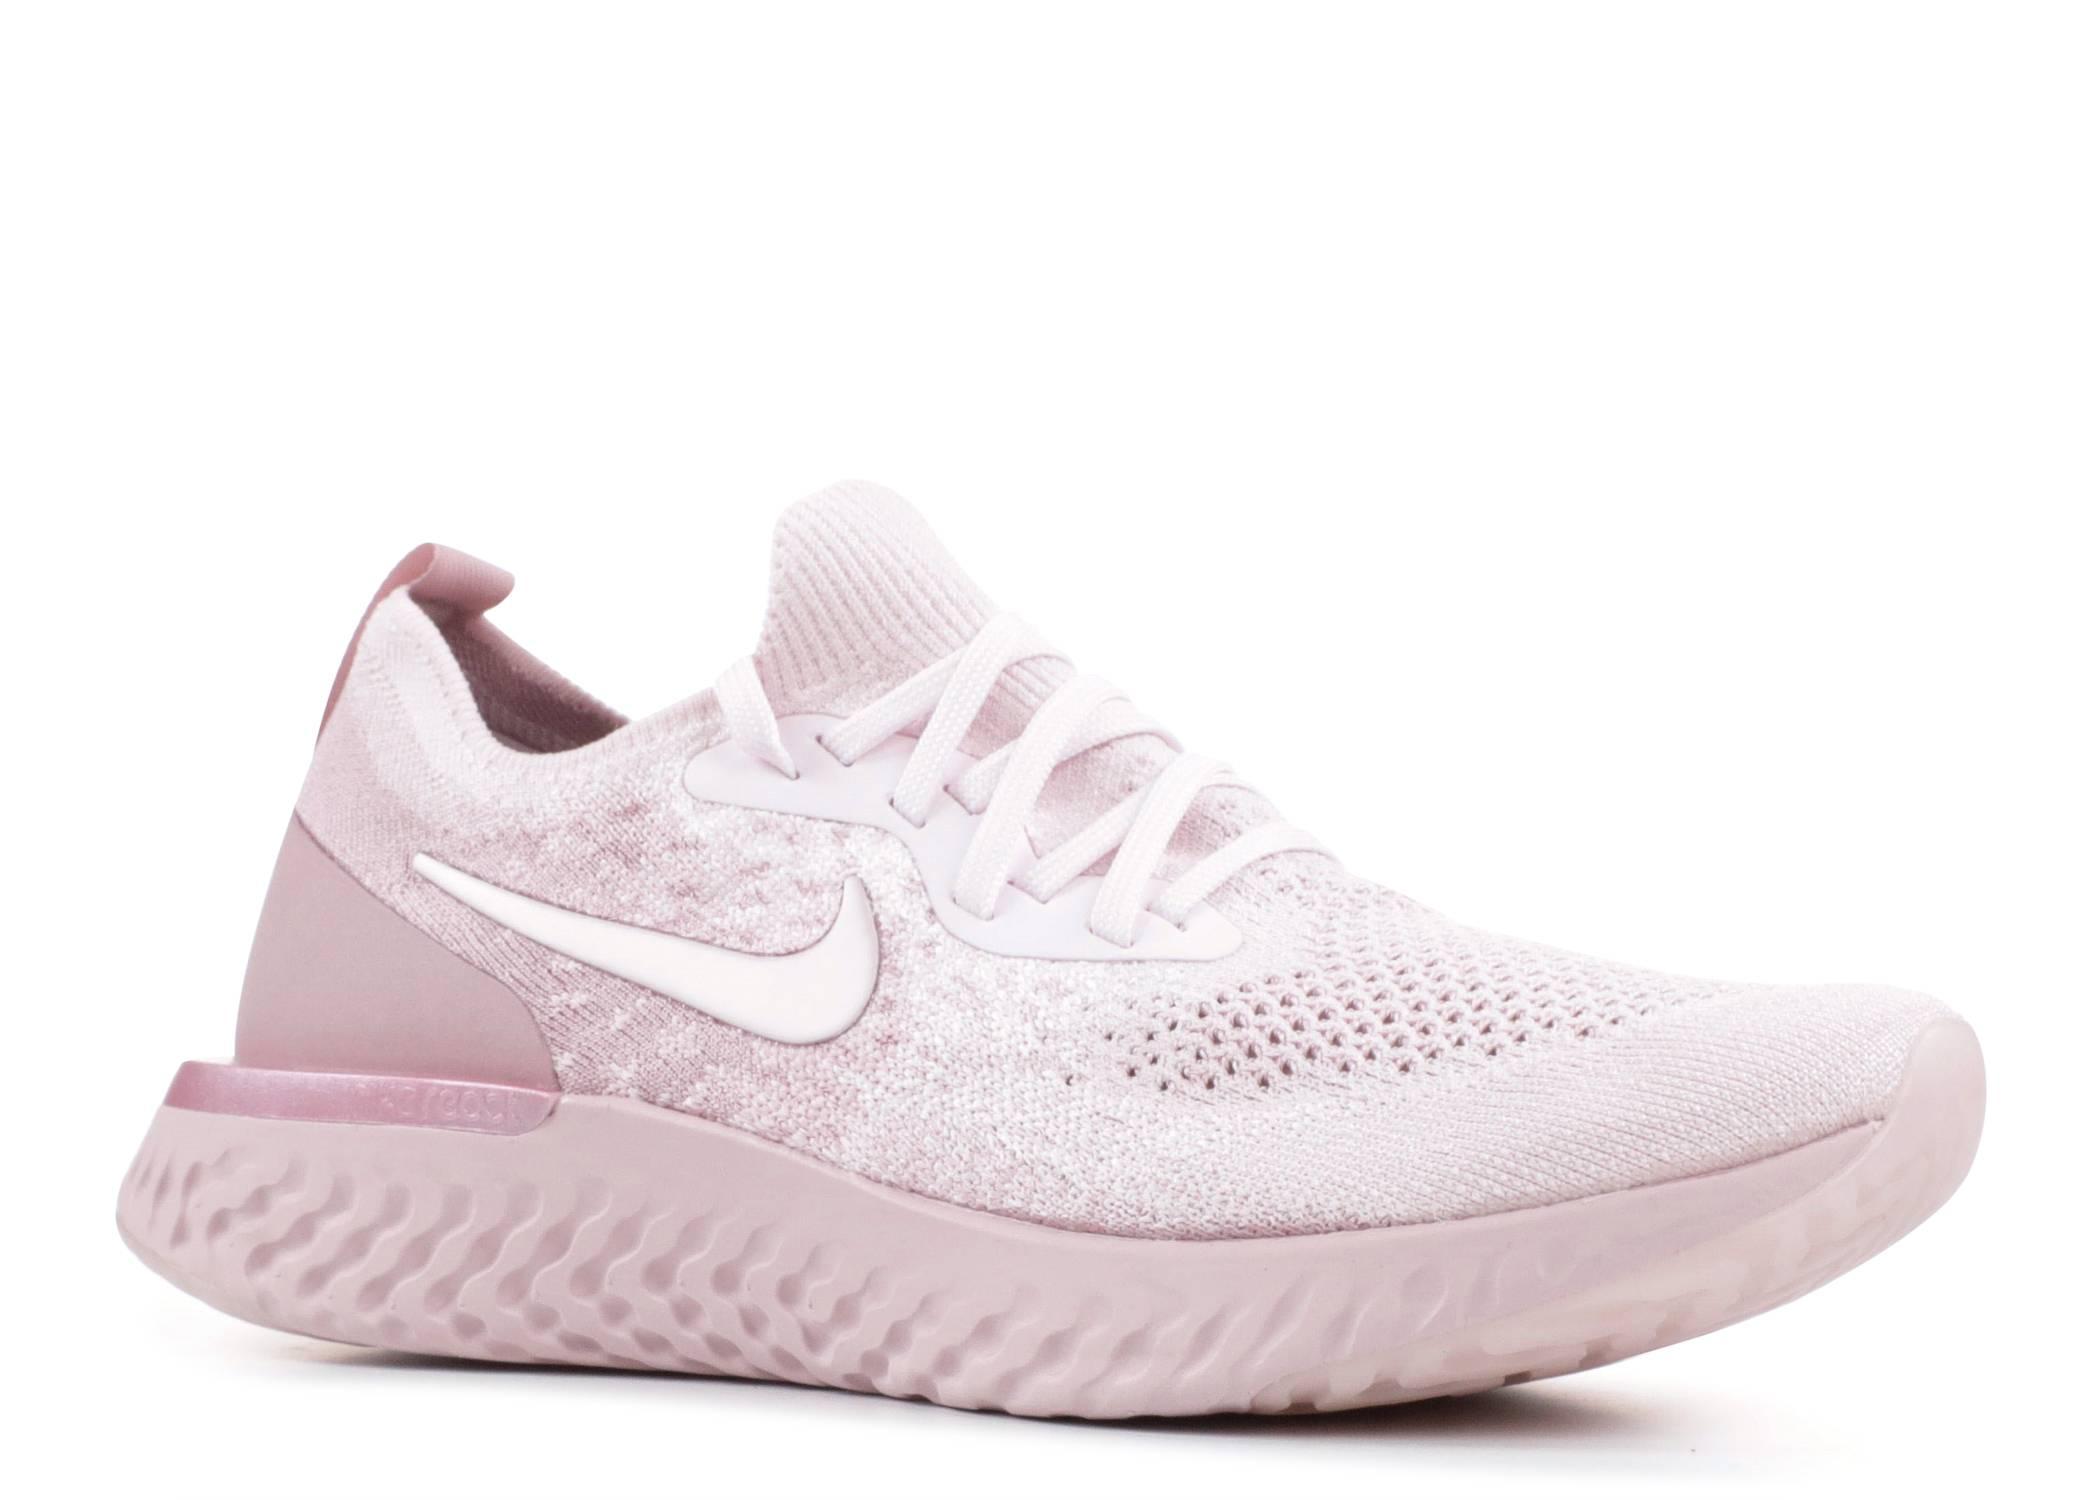 8c9280254dd WMNS Nike Epic React Flyknit - Nike - AQ0070 600 - pearl pink pearl pink